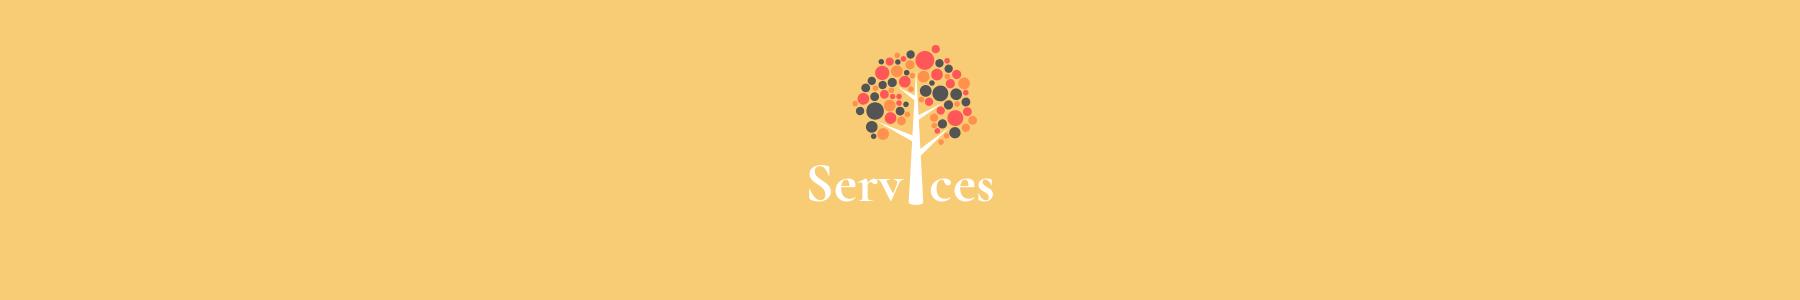 Genealogy Service